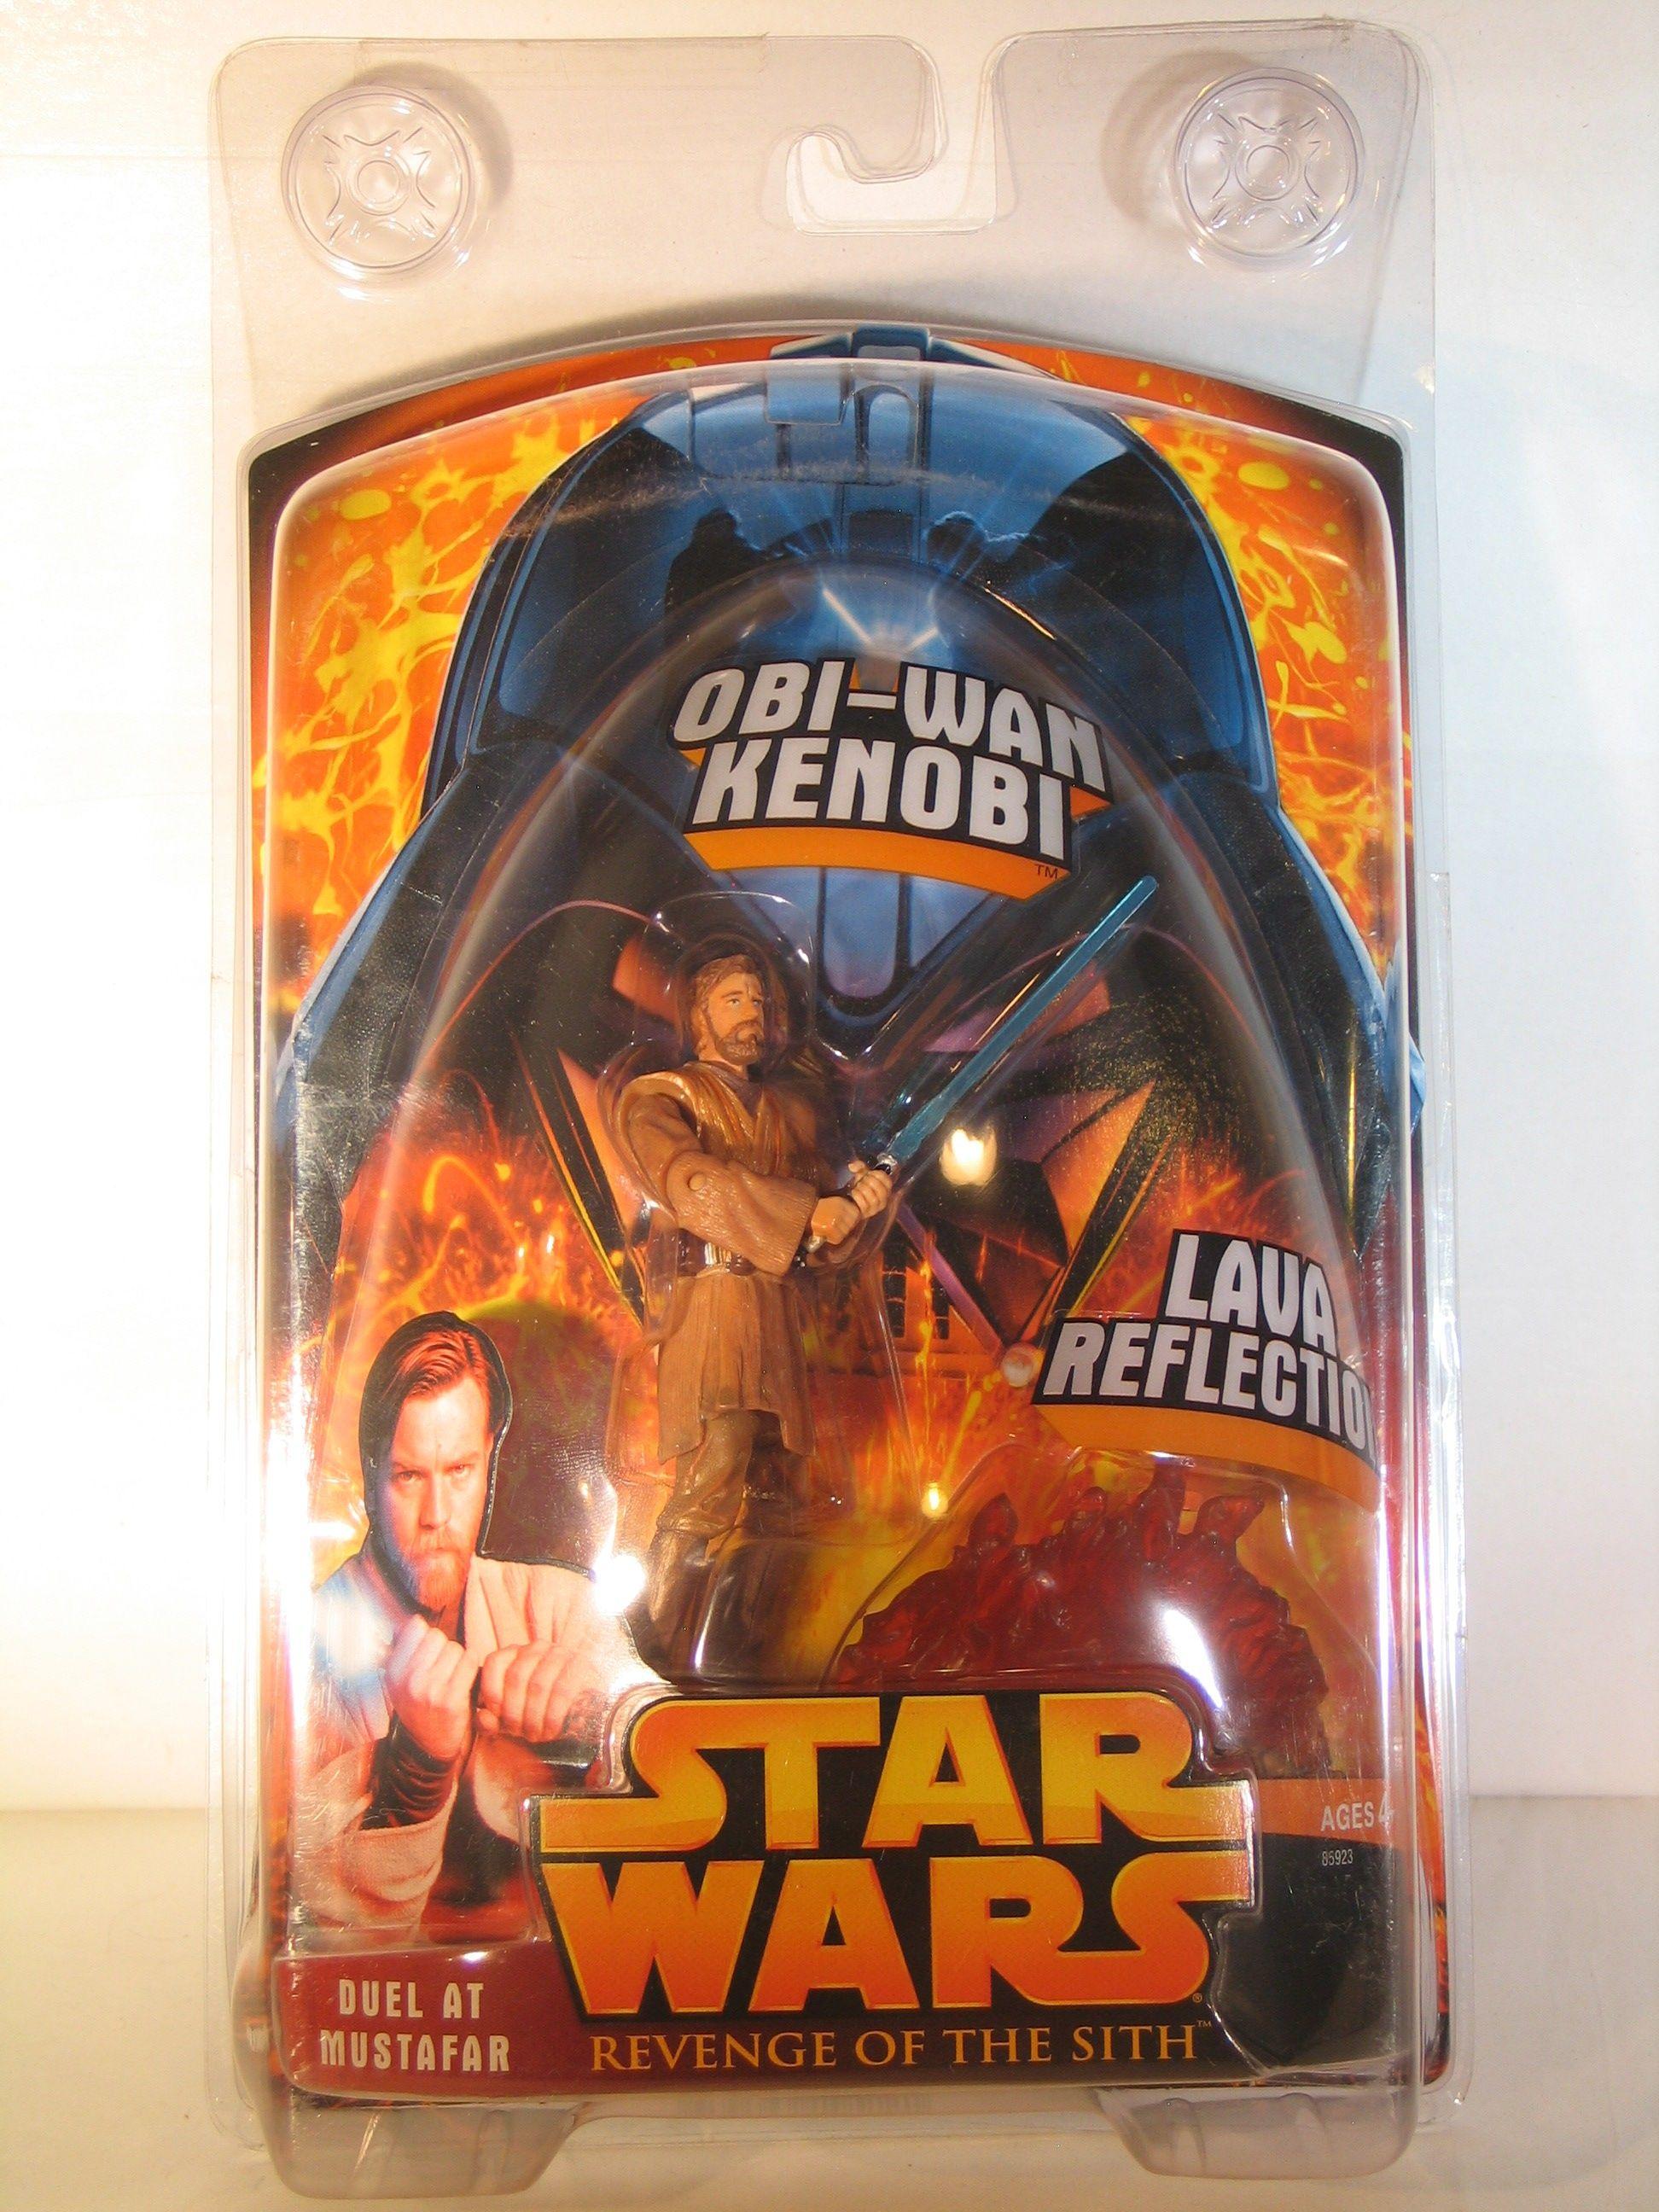 Star Wars Revenge Of The Sith Duel At Mustafar Obi Wan Kenobi For Sale Item 1439280